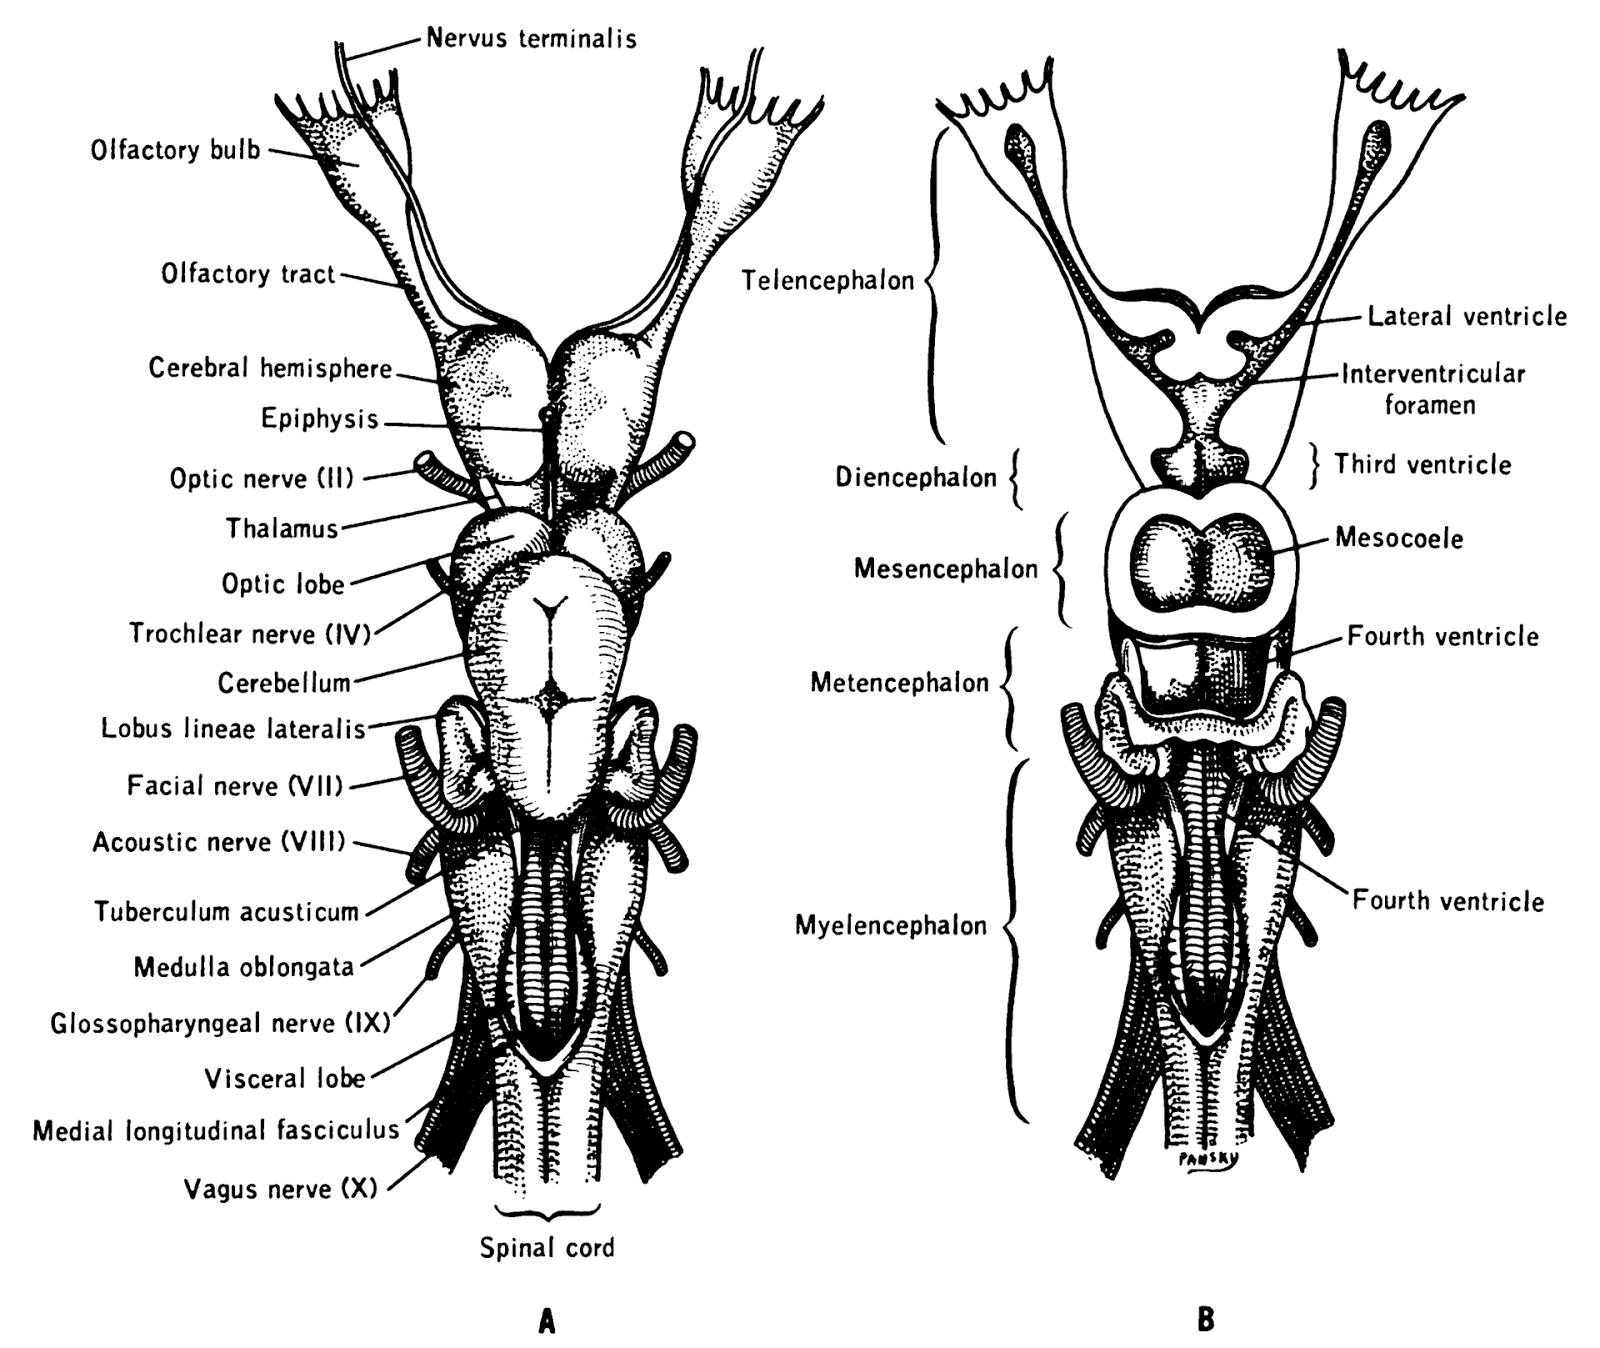 Cranial Nerve 13 and Cranial Nerve 14